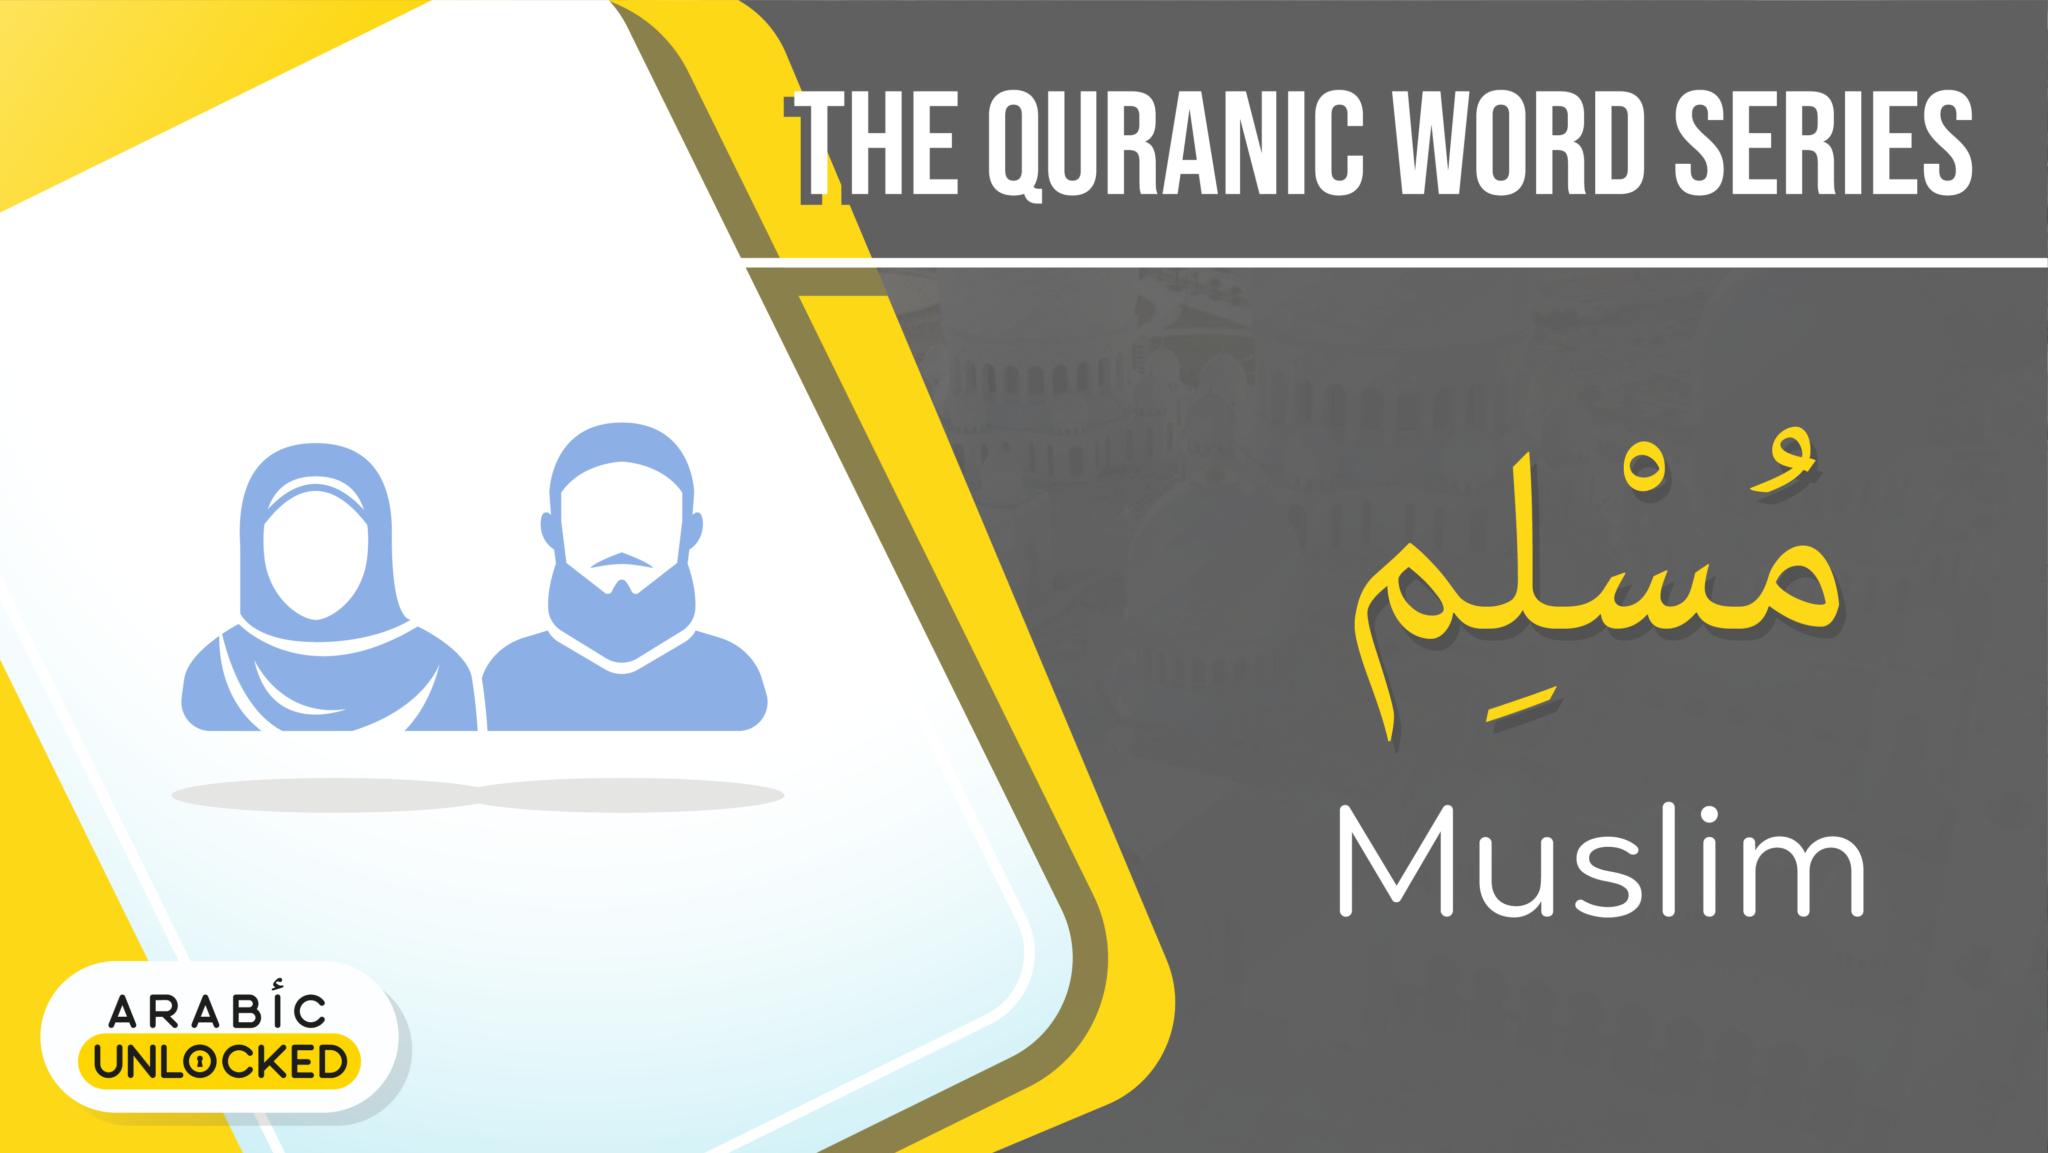 The Quranic Words Series: Muslim